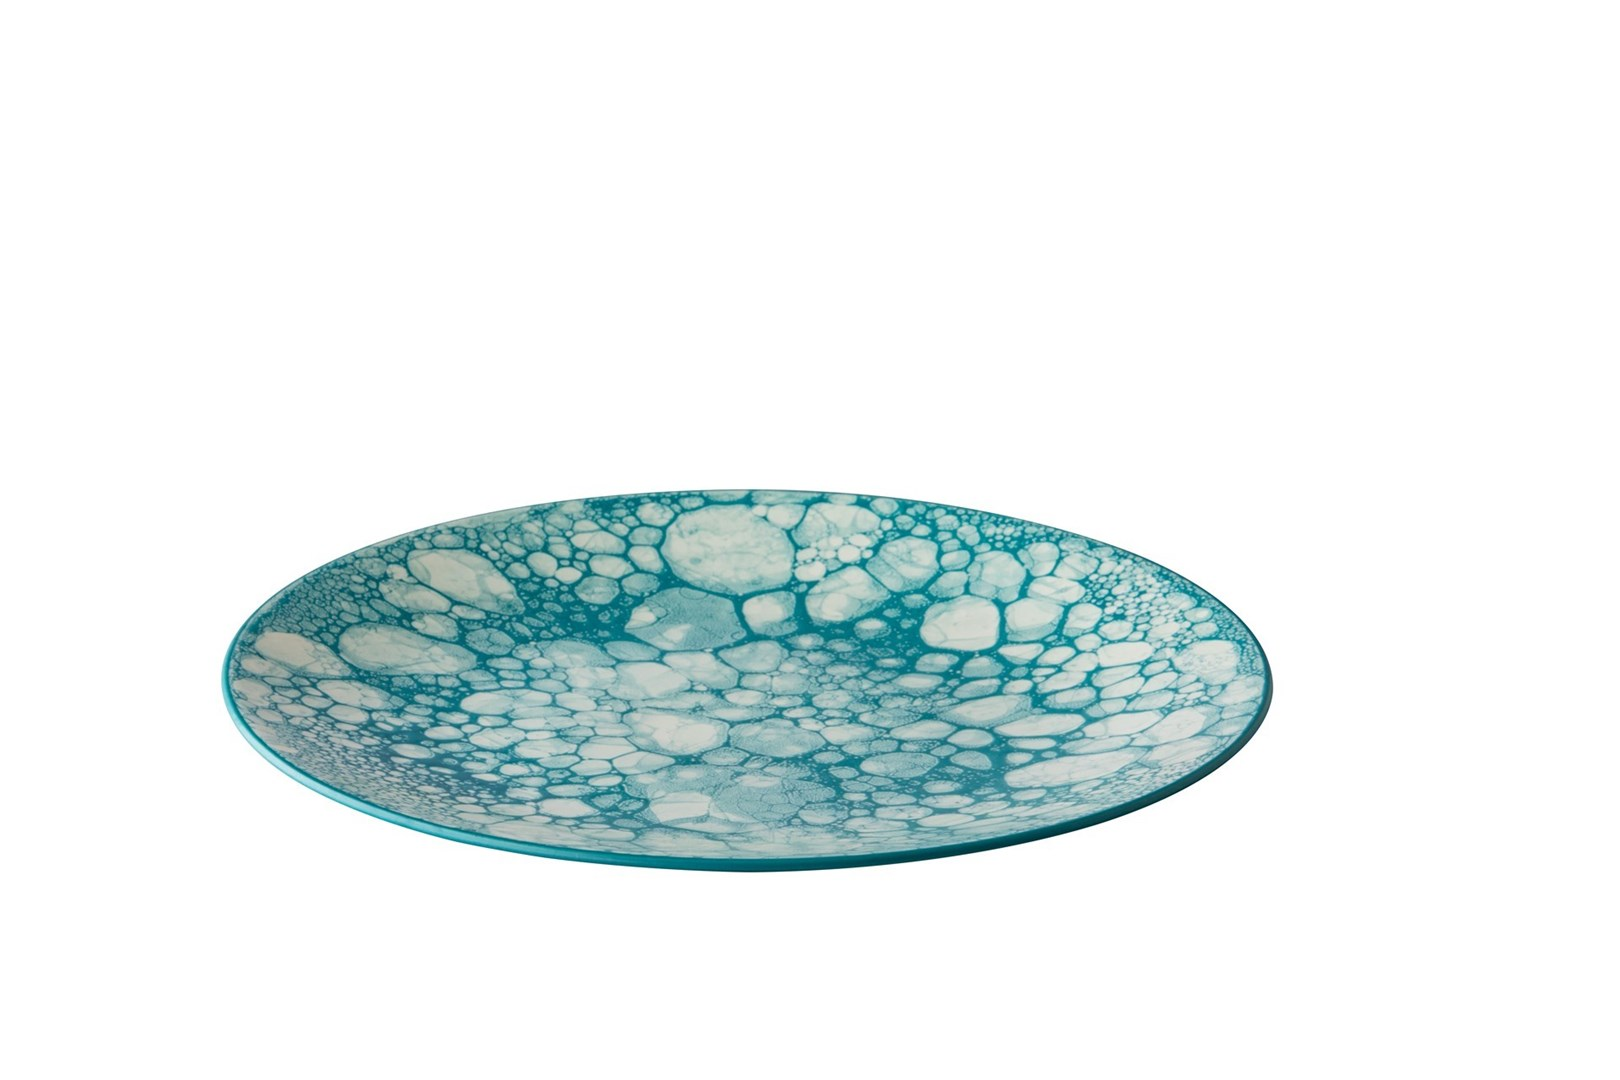 Productafbeelding Bord Bubble turquoise 27,5 cm